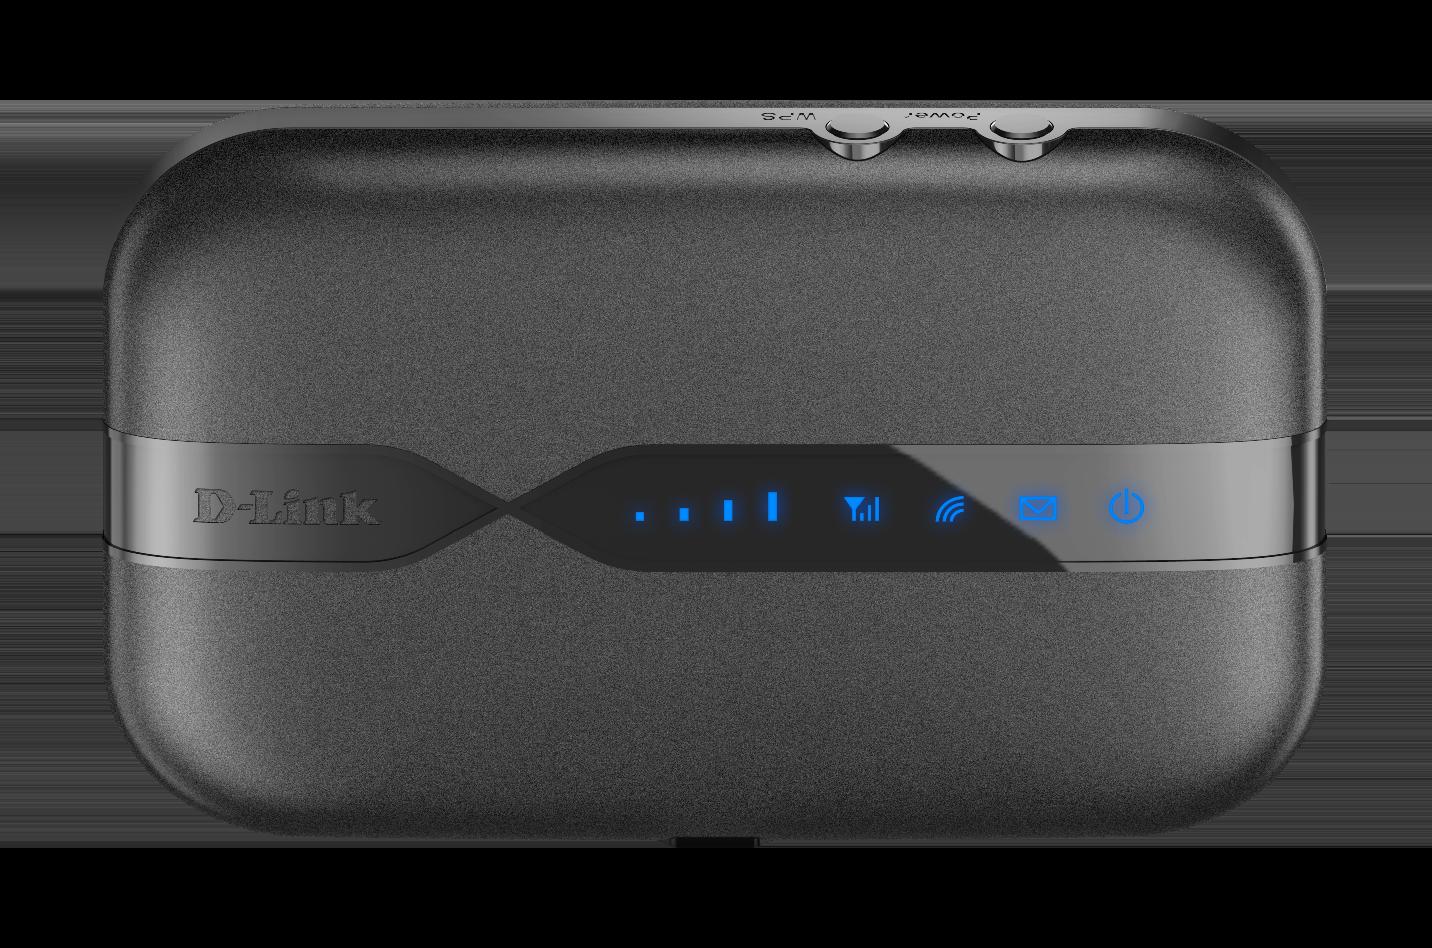 D-Link DWR-932 RevD Router New